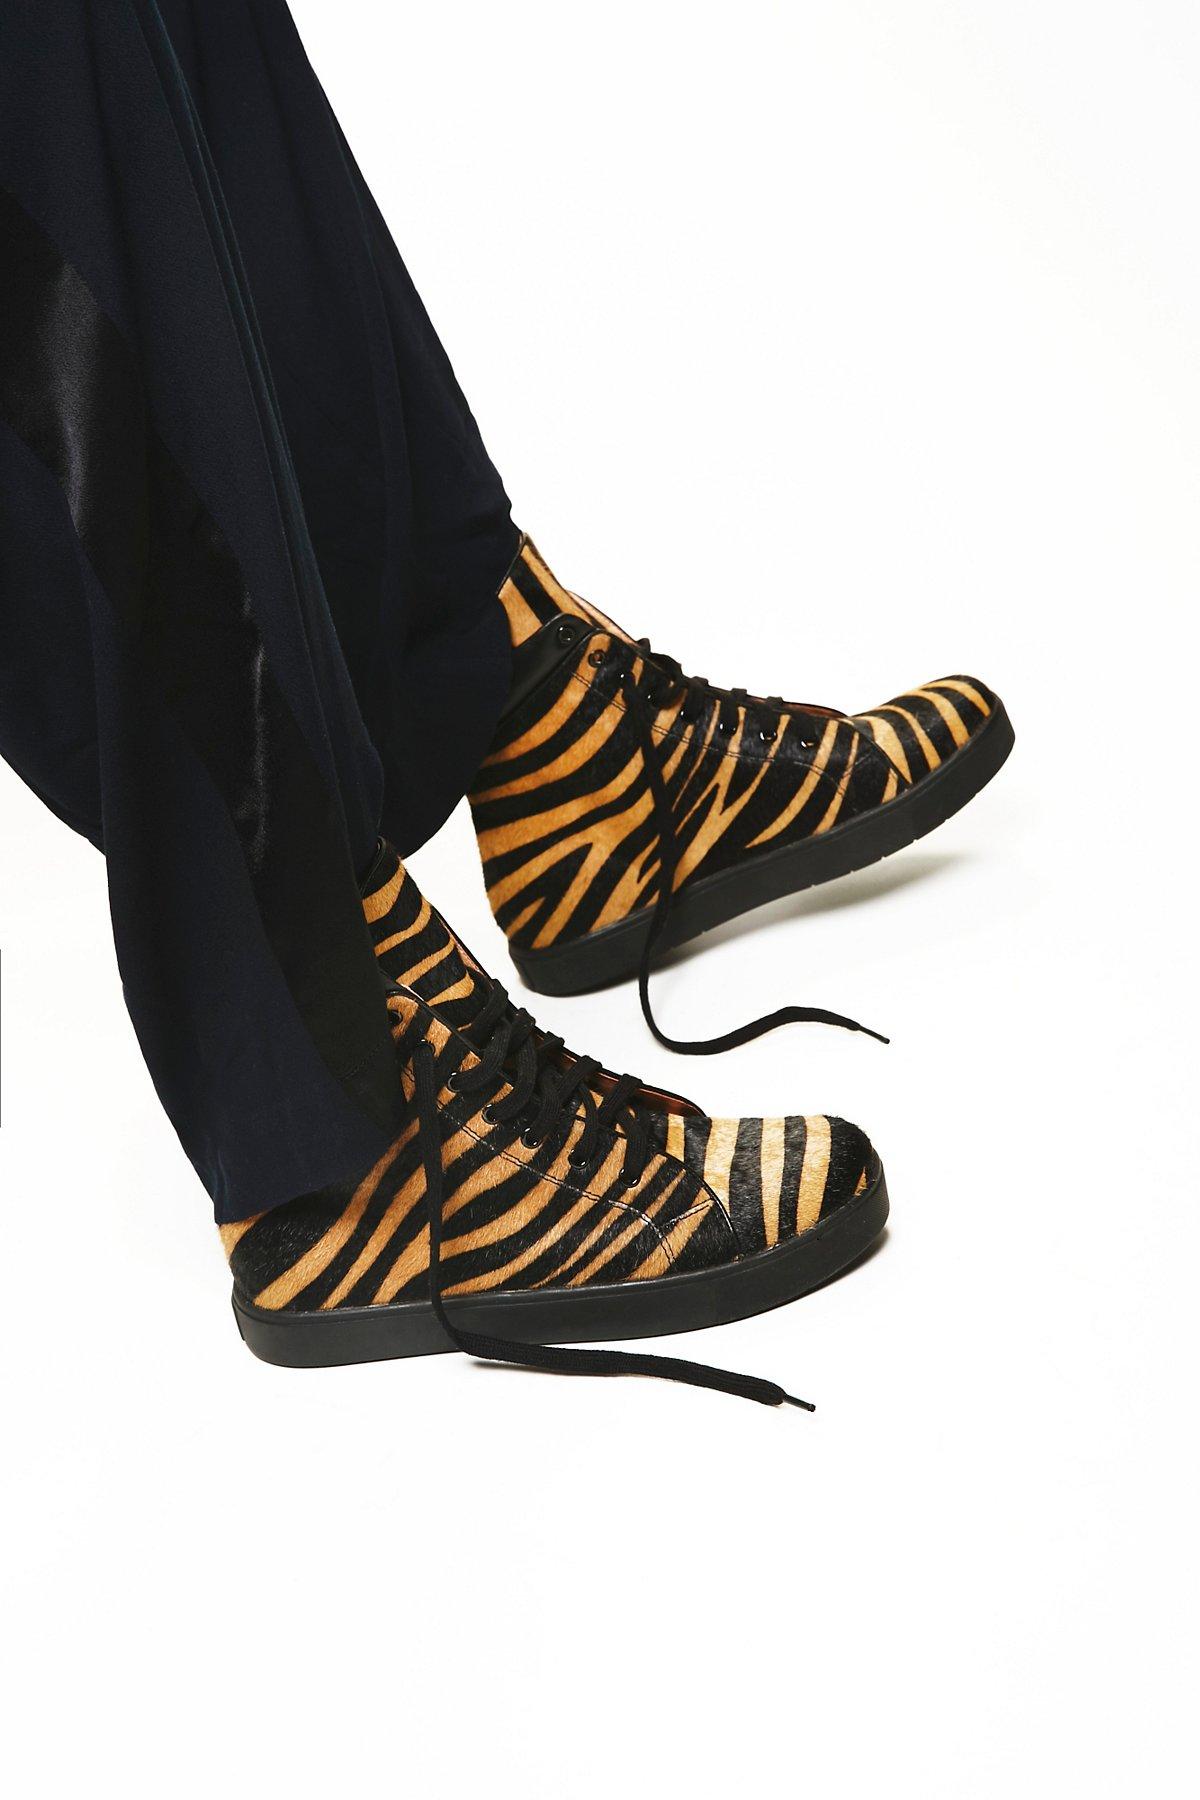 Tiger Hi-Top Sneaker